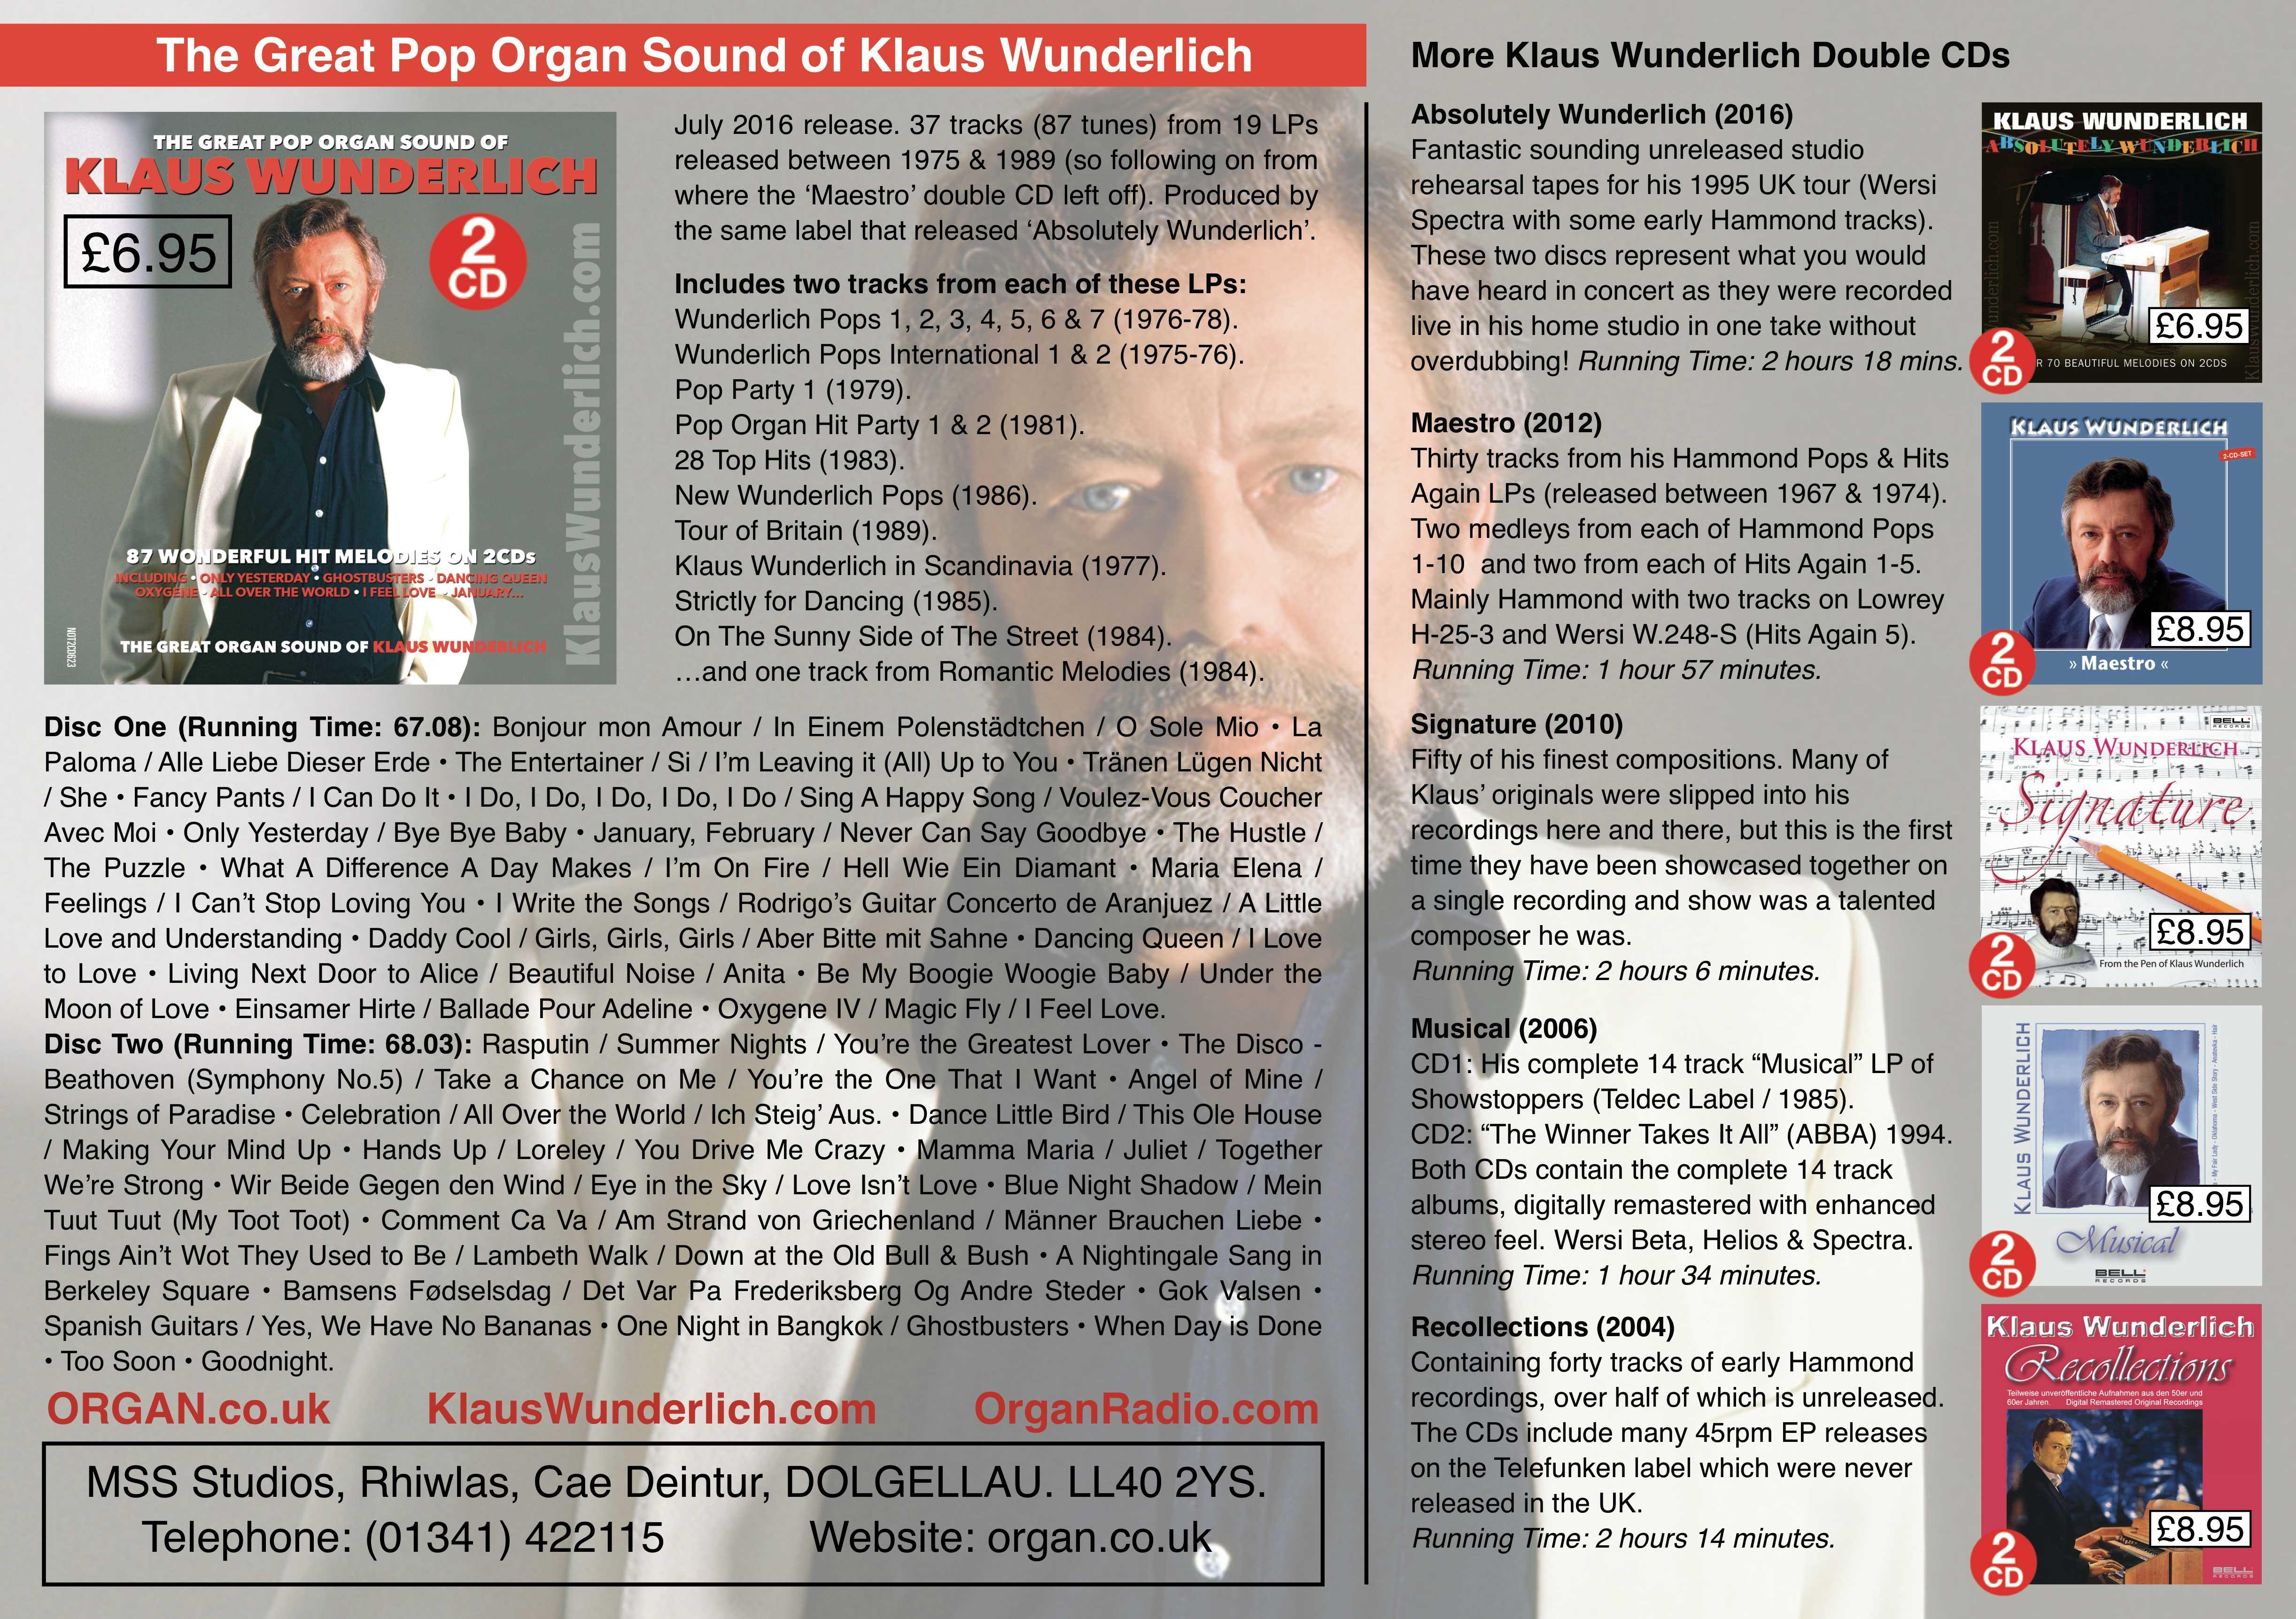 The Great Pop Organ Sound Of Klaus Wunderlich (Promotional Flyer)